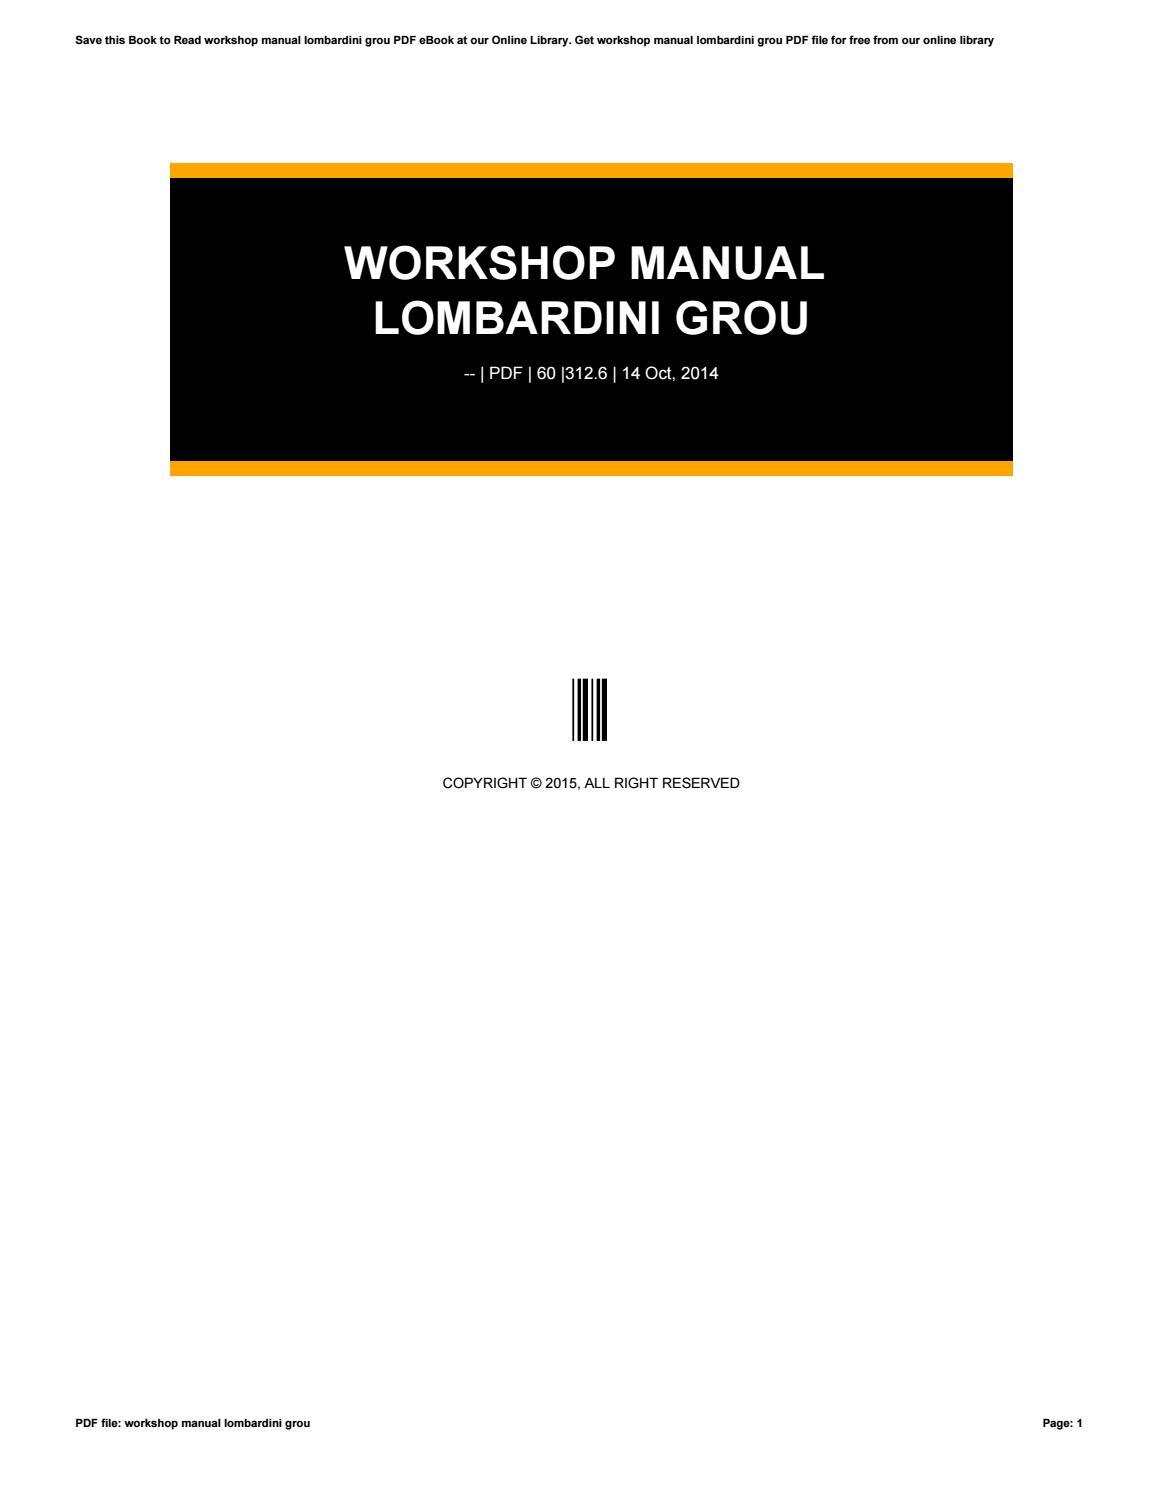 lombardini diesel engine Array - workshop manual lombardini grou by  virginiacowan3163 issuu rh issuu ...